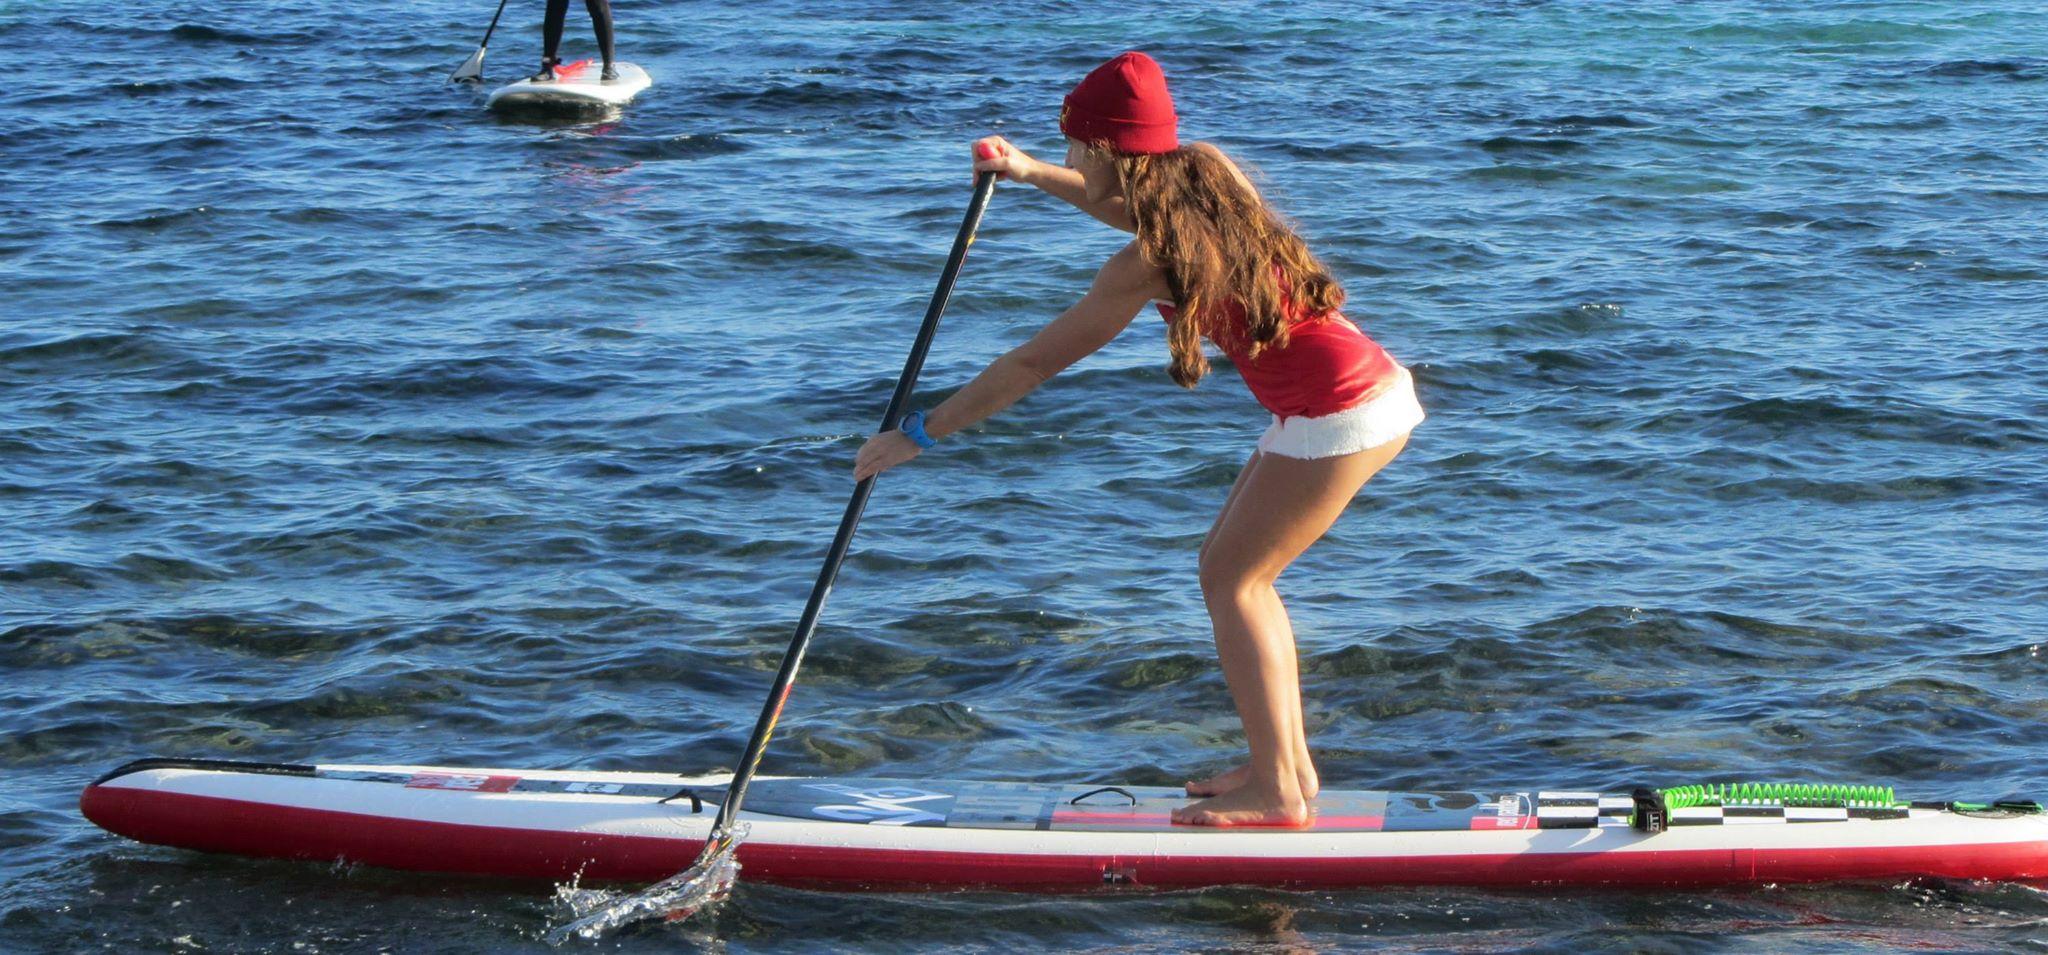 stand-up-paddle-interview-virginie-samson-3